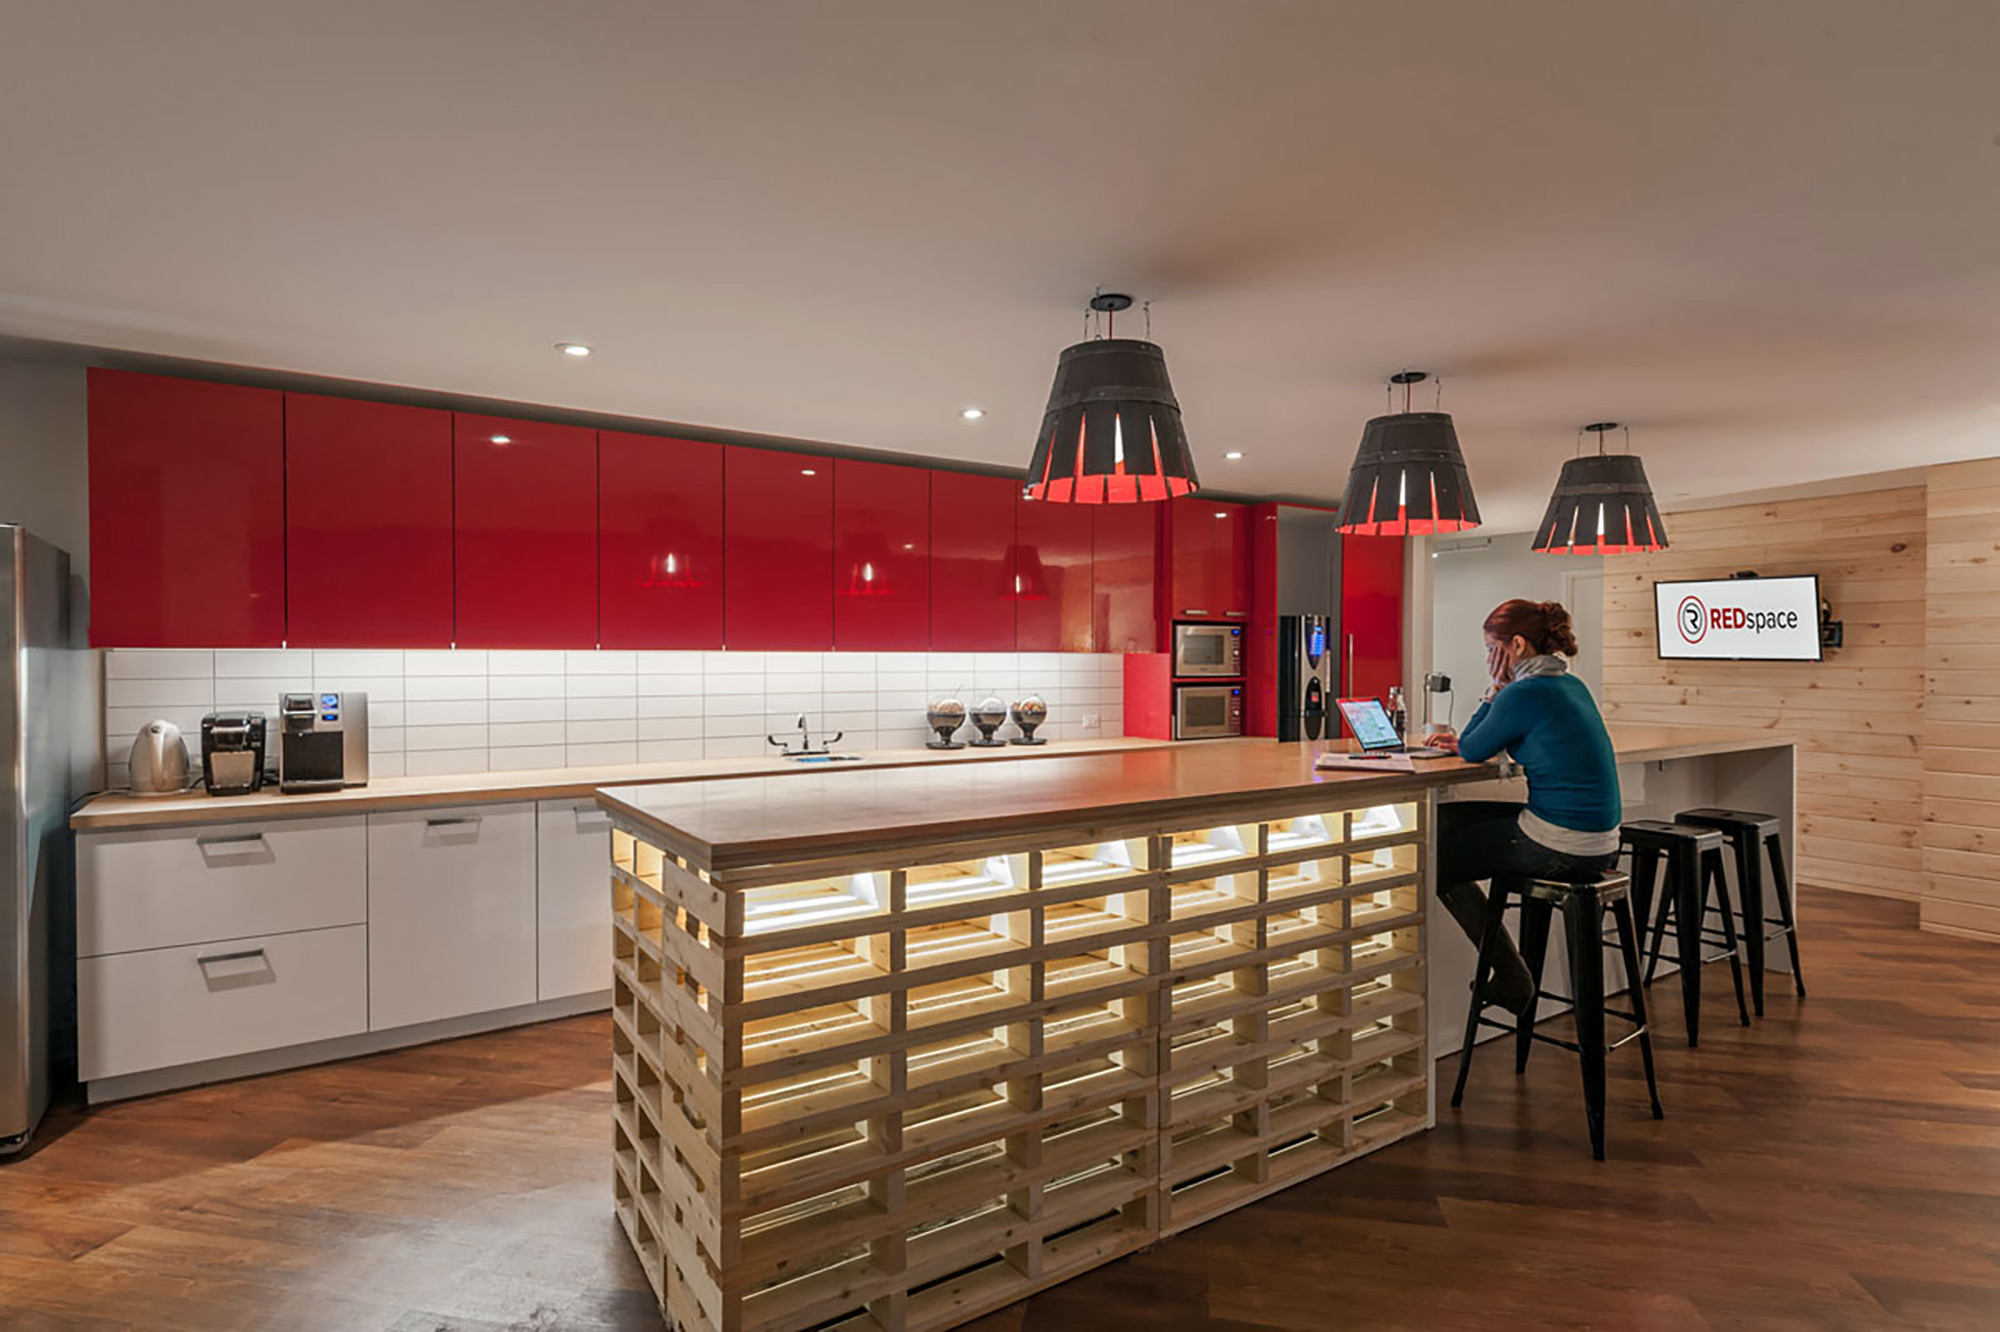 interior-design-corporate-office-kitchen-area.jpg